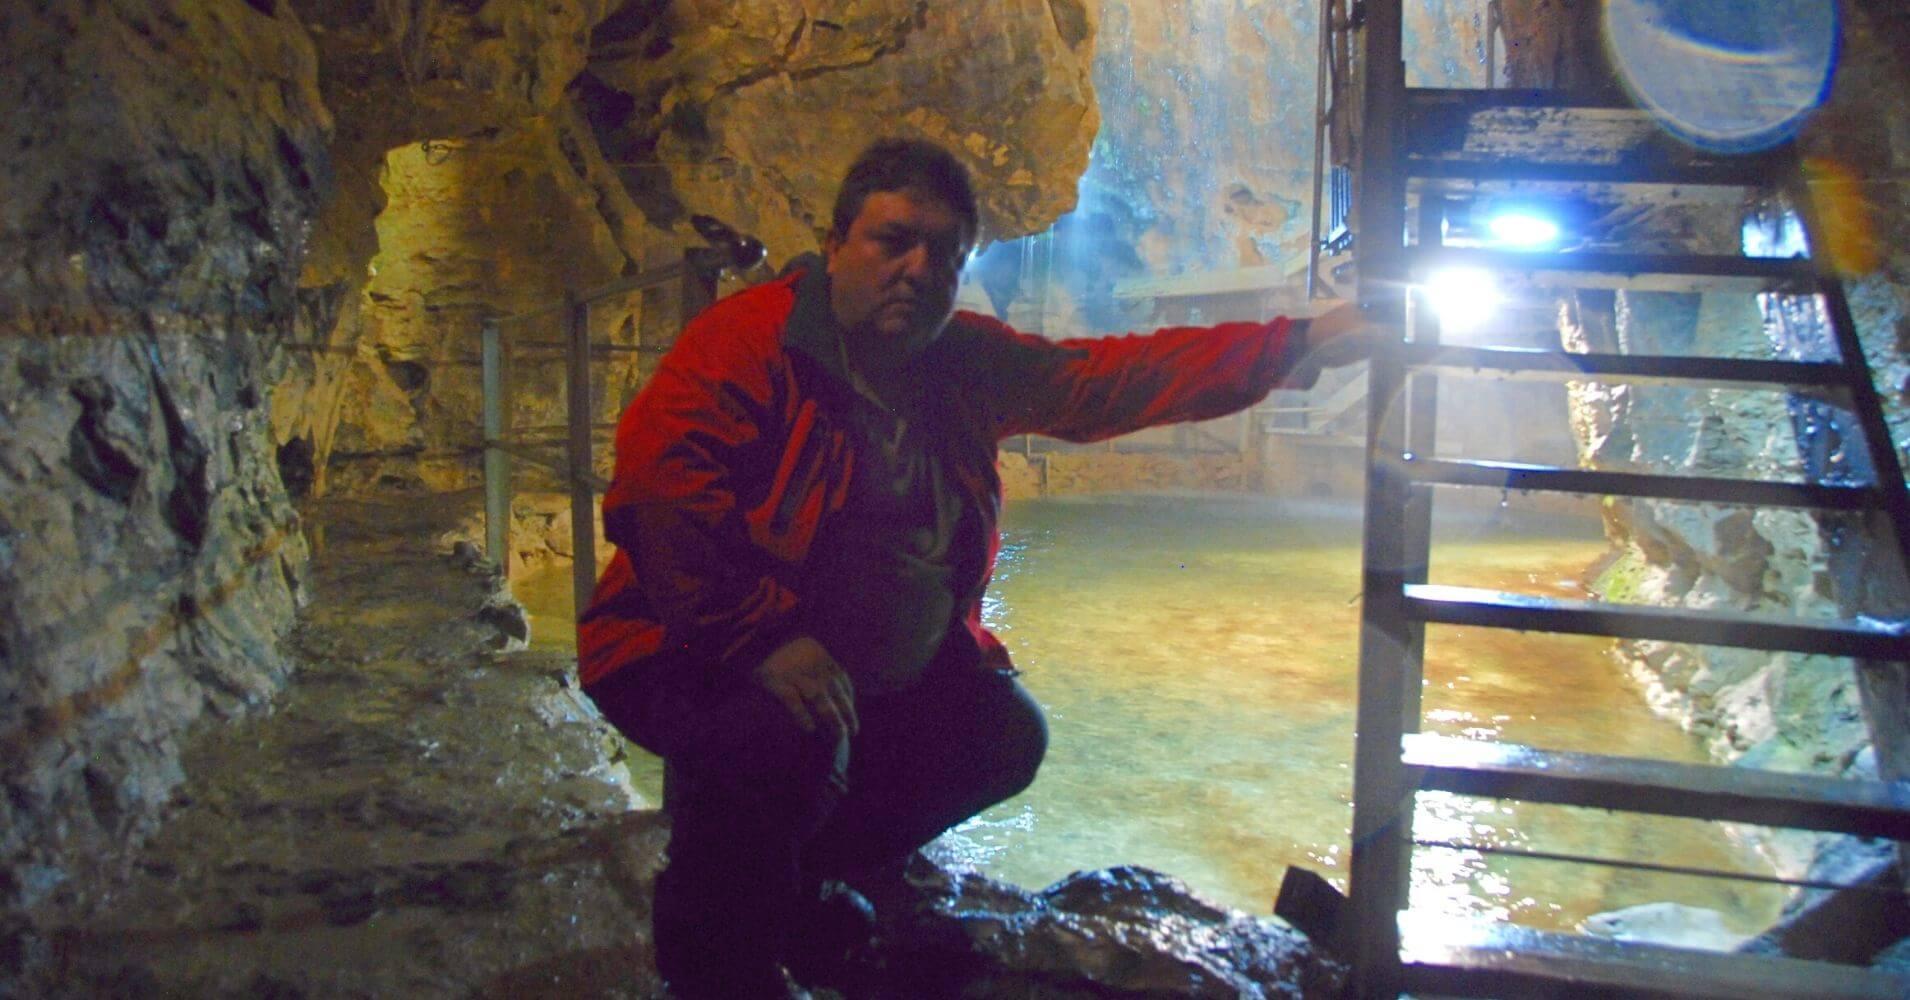 Lago y Cascada de la Grotte Aux Fées. Cueva de las Hadas. St. Maurice, Valais. Suiza.